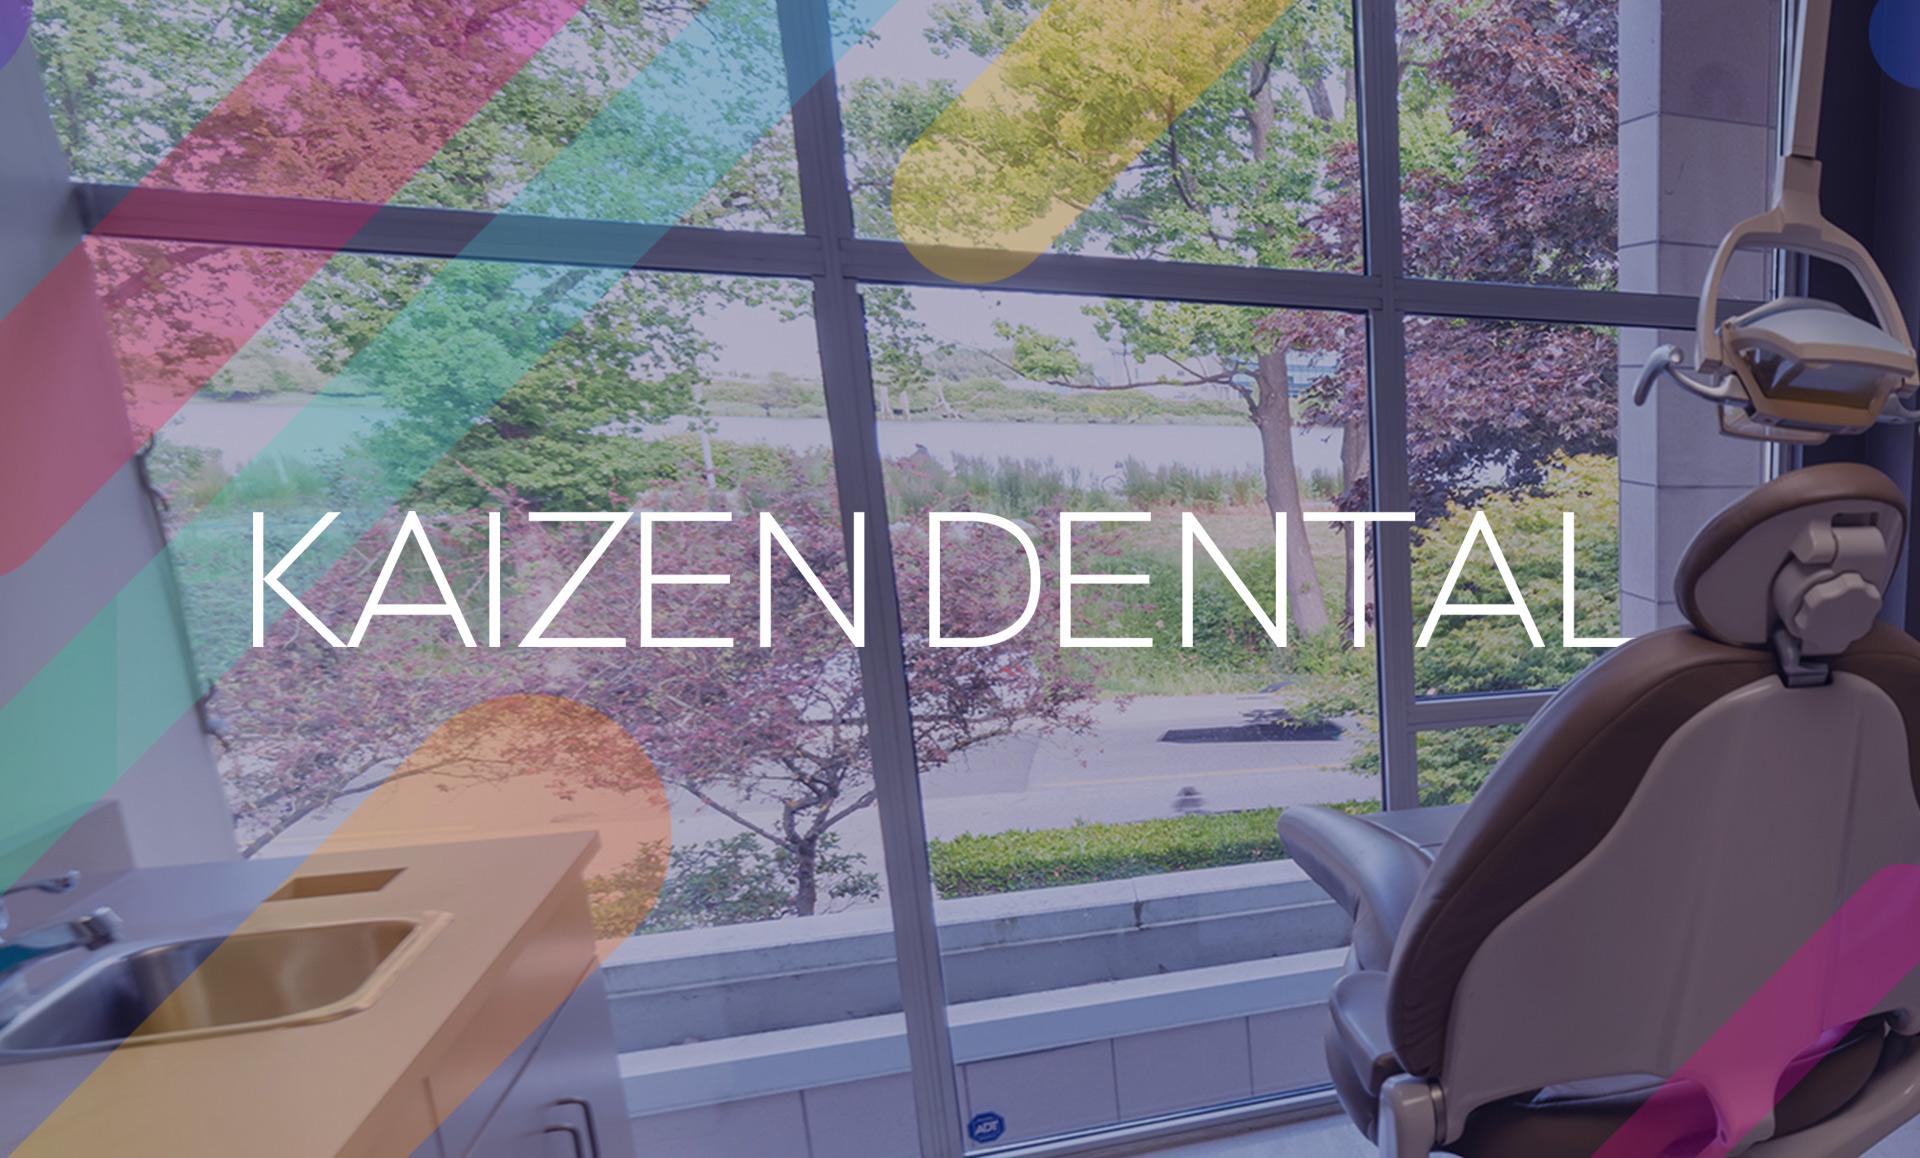 Read more on Kaizen Dental